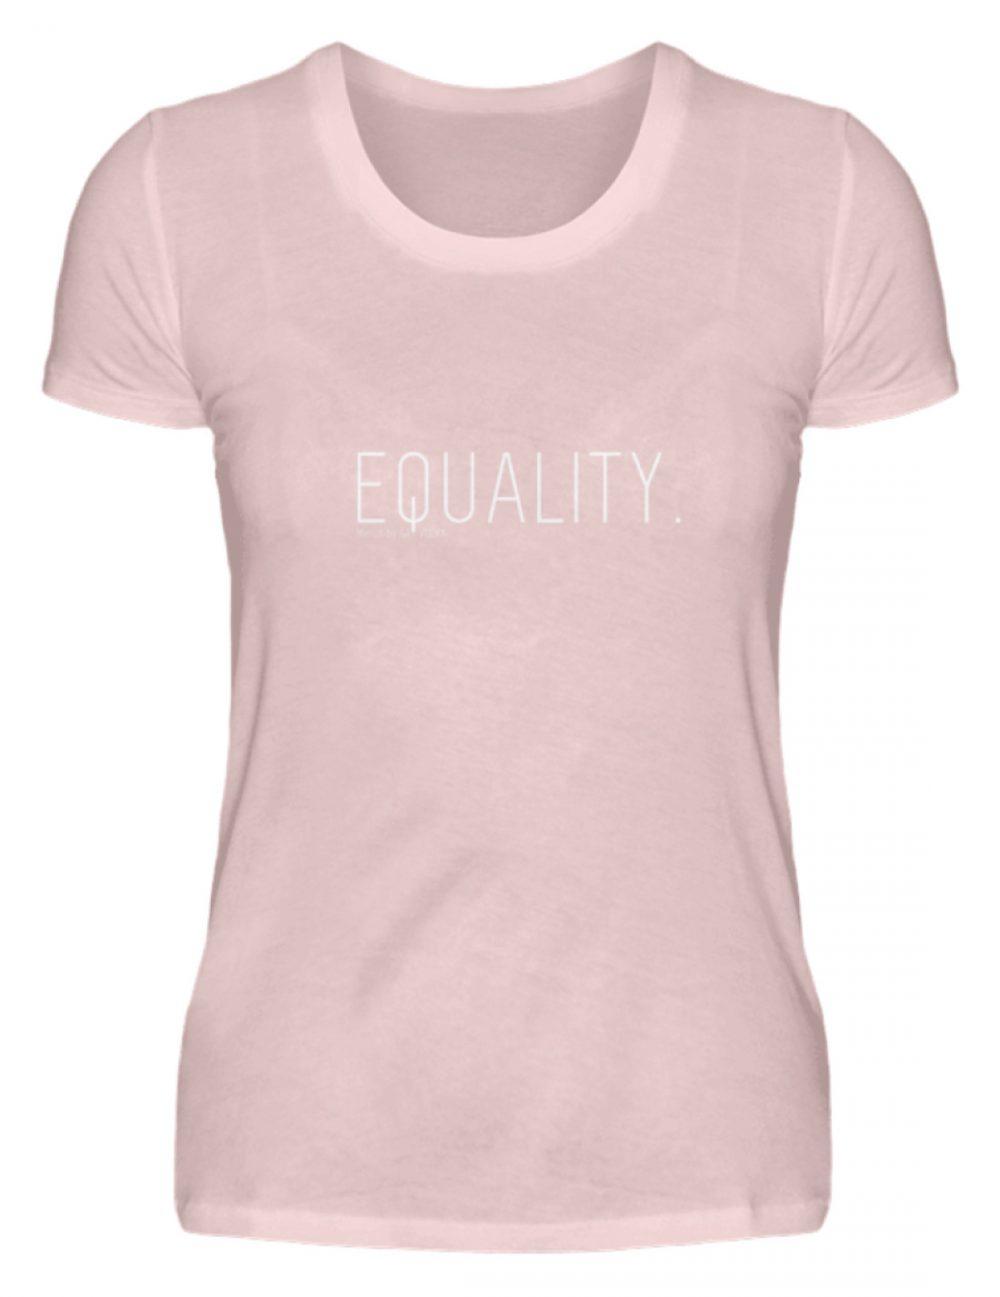 EQUALITY. - Damen Premiumshirt-5949